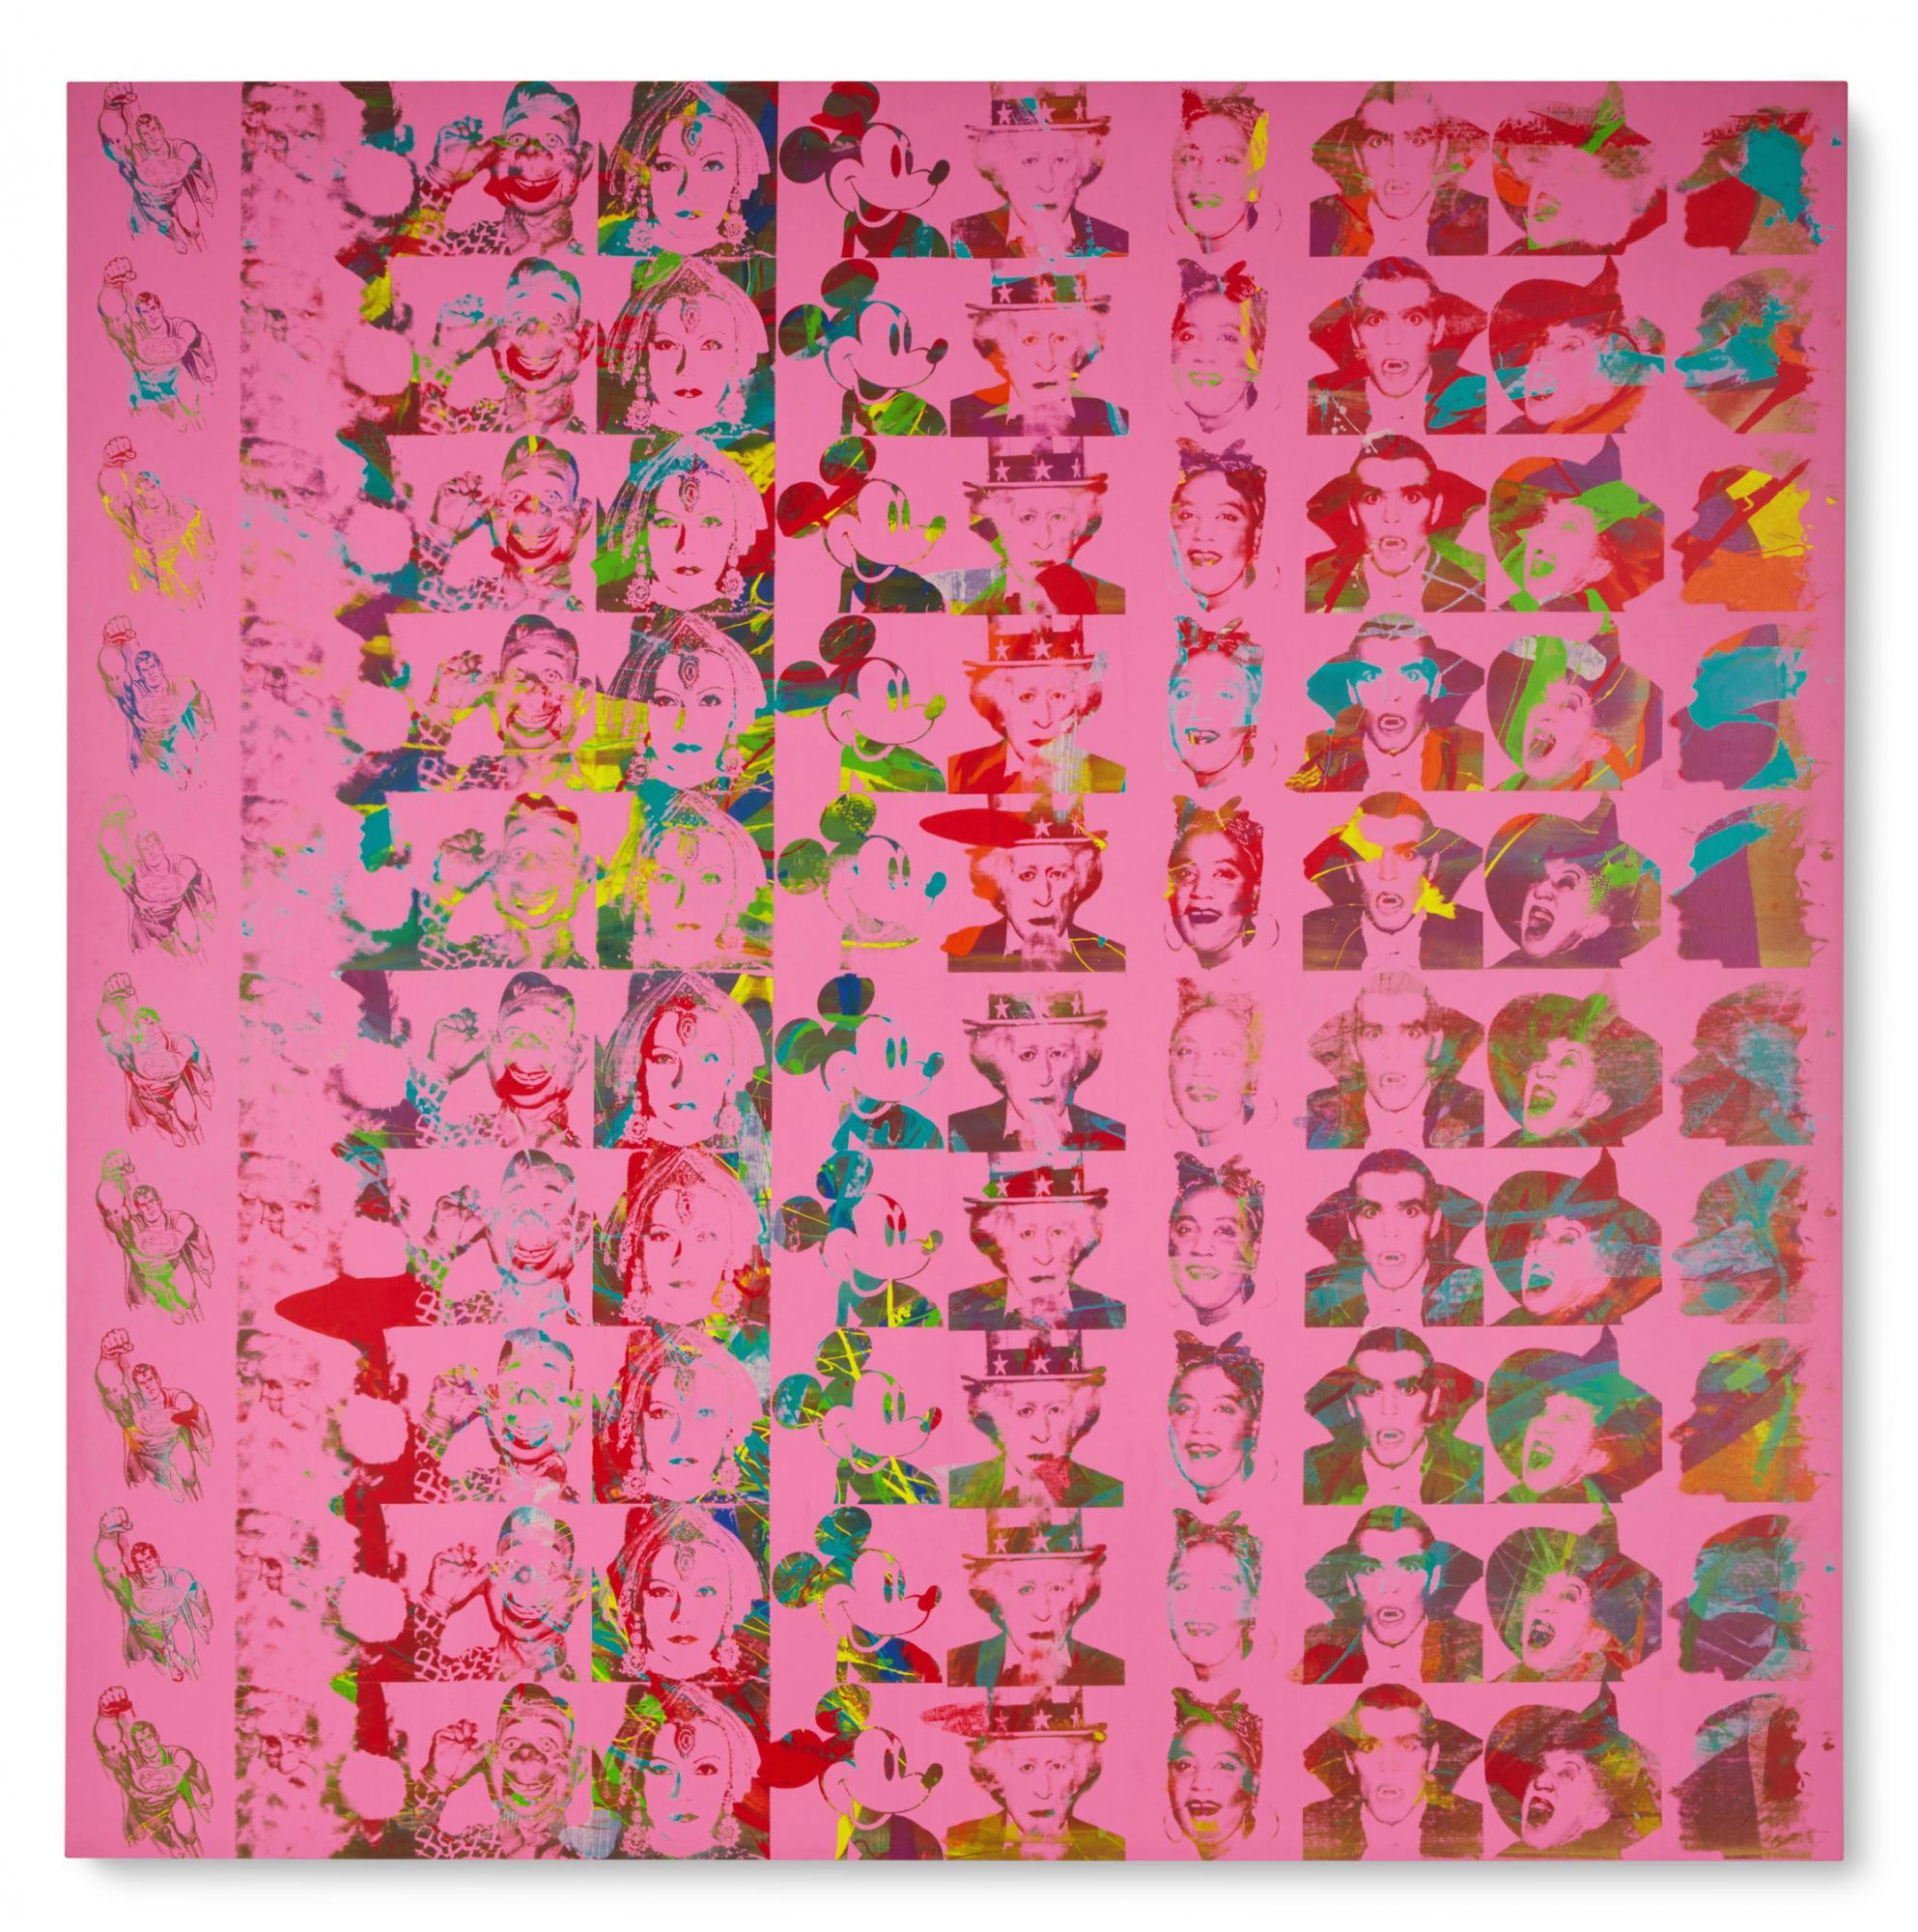 Lot-131,-Andy-Warhol,-Myths-(Multiple),-est.jpg